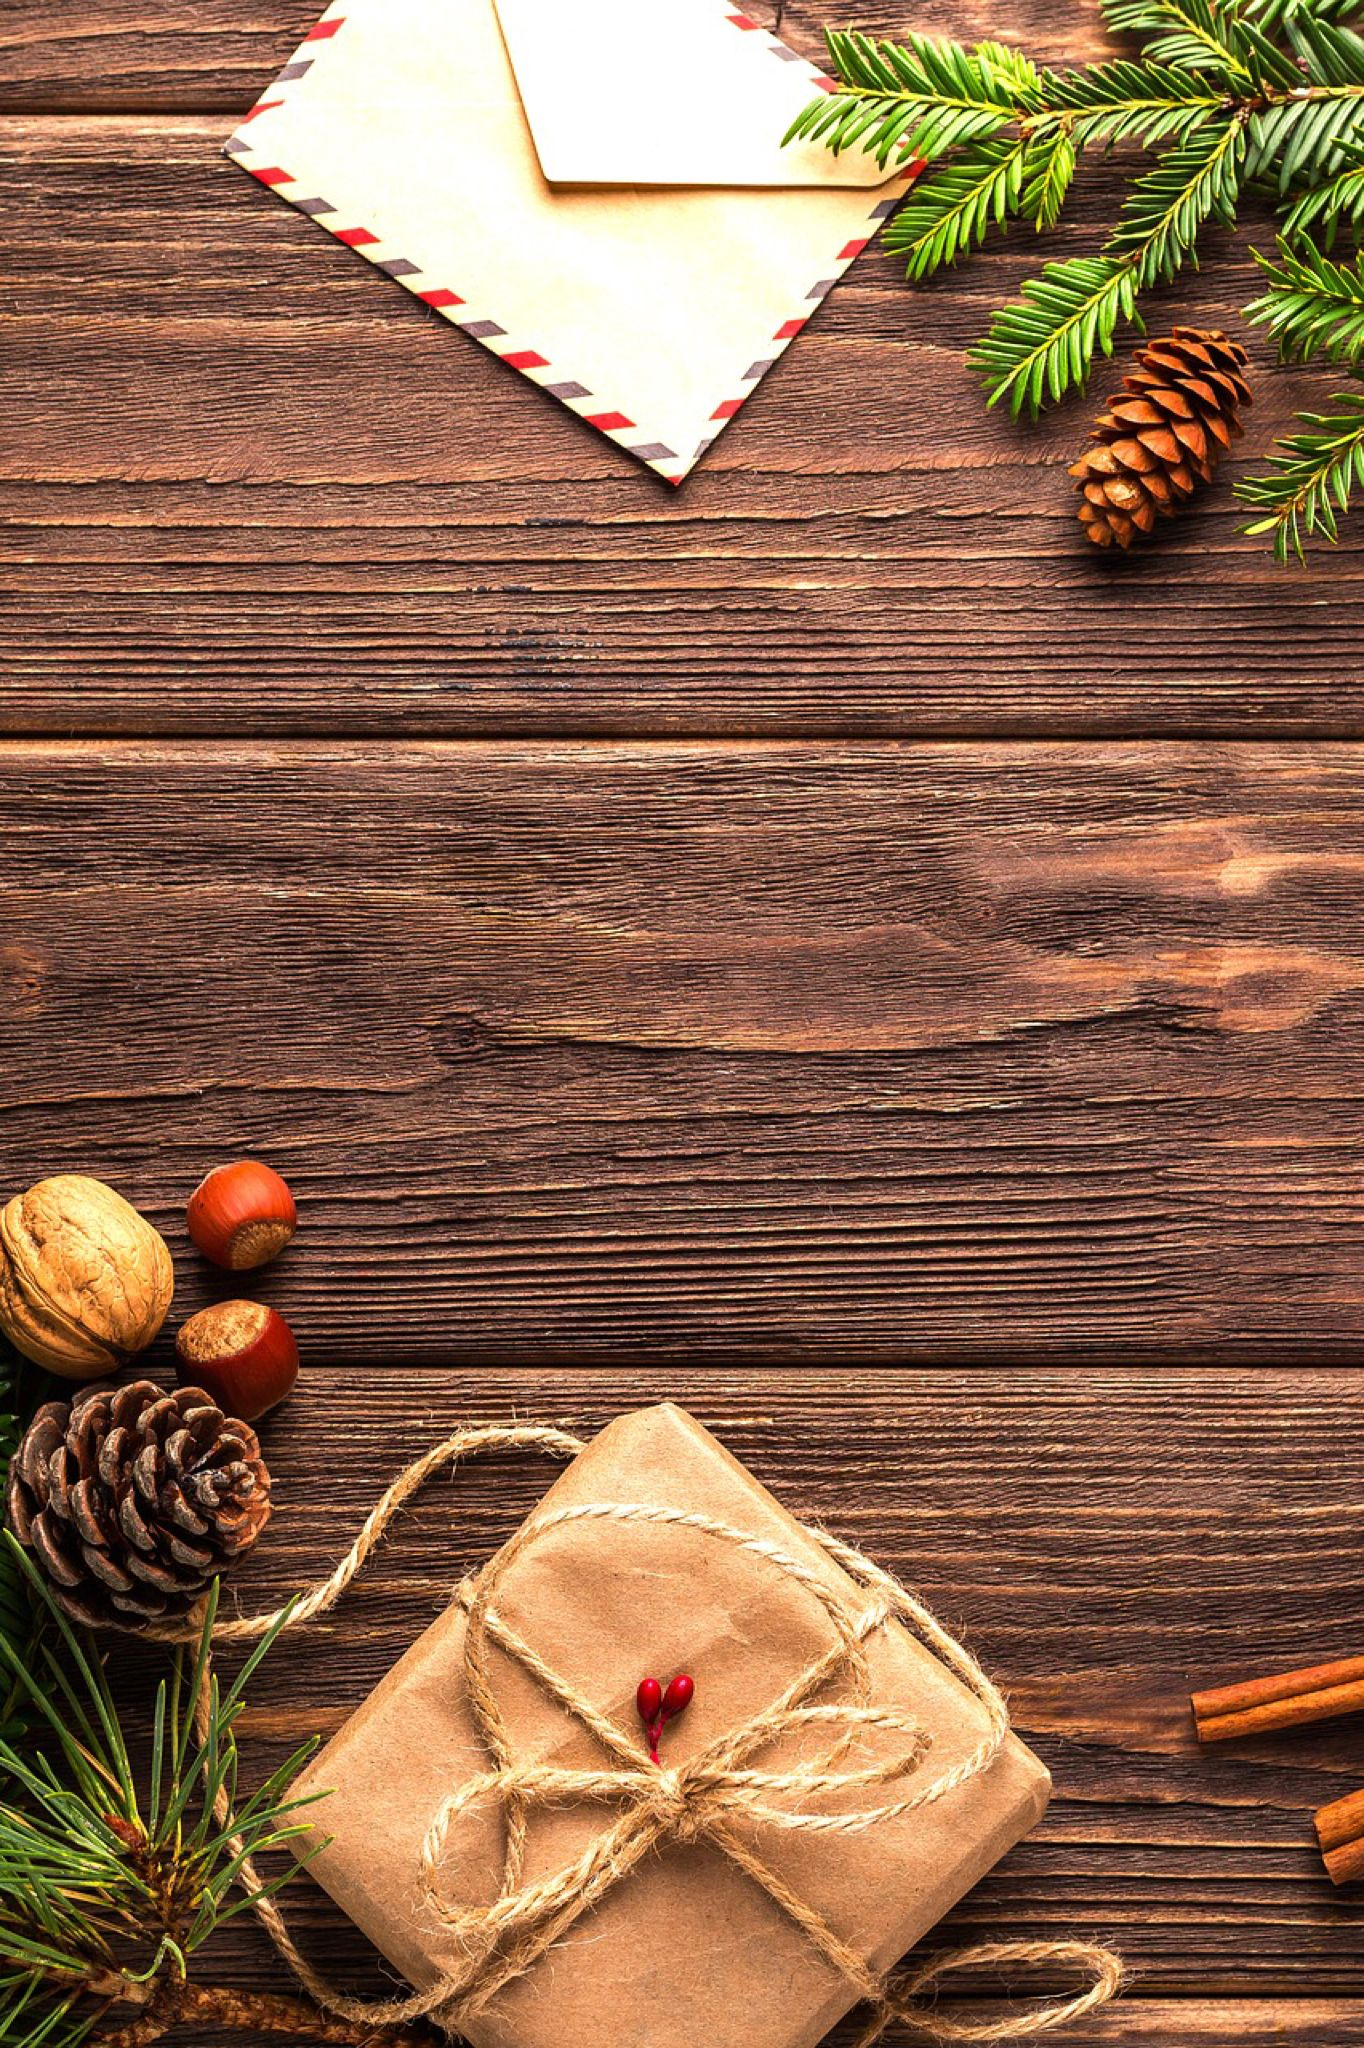 Christmas Wallpaper Backgrounds Pinterest